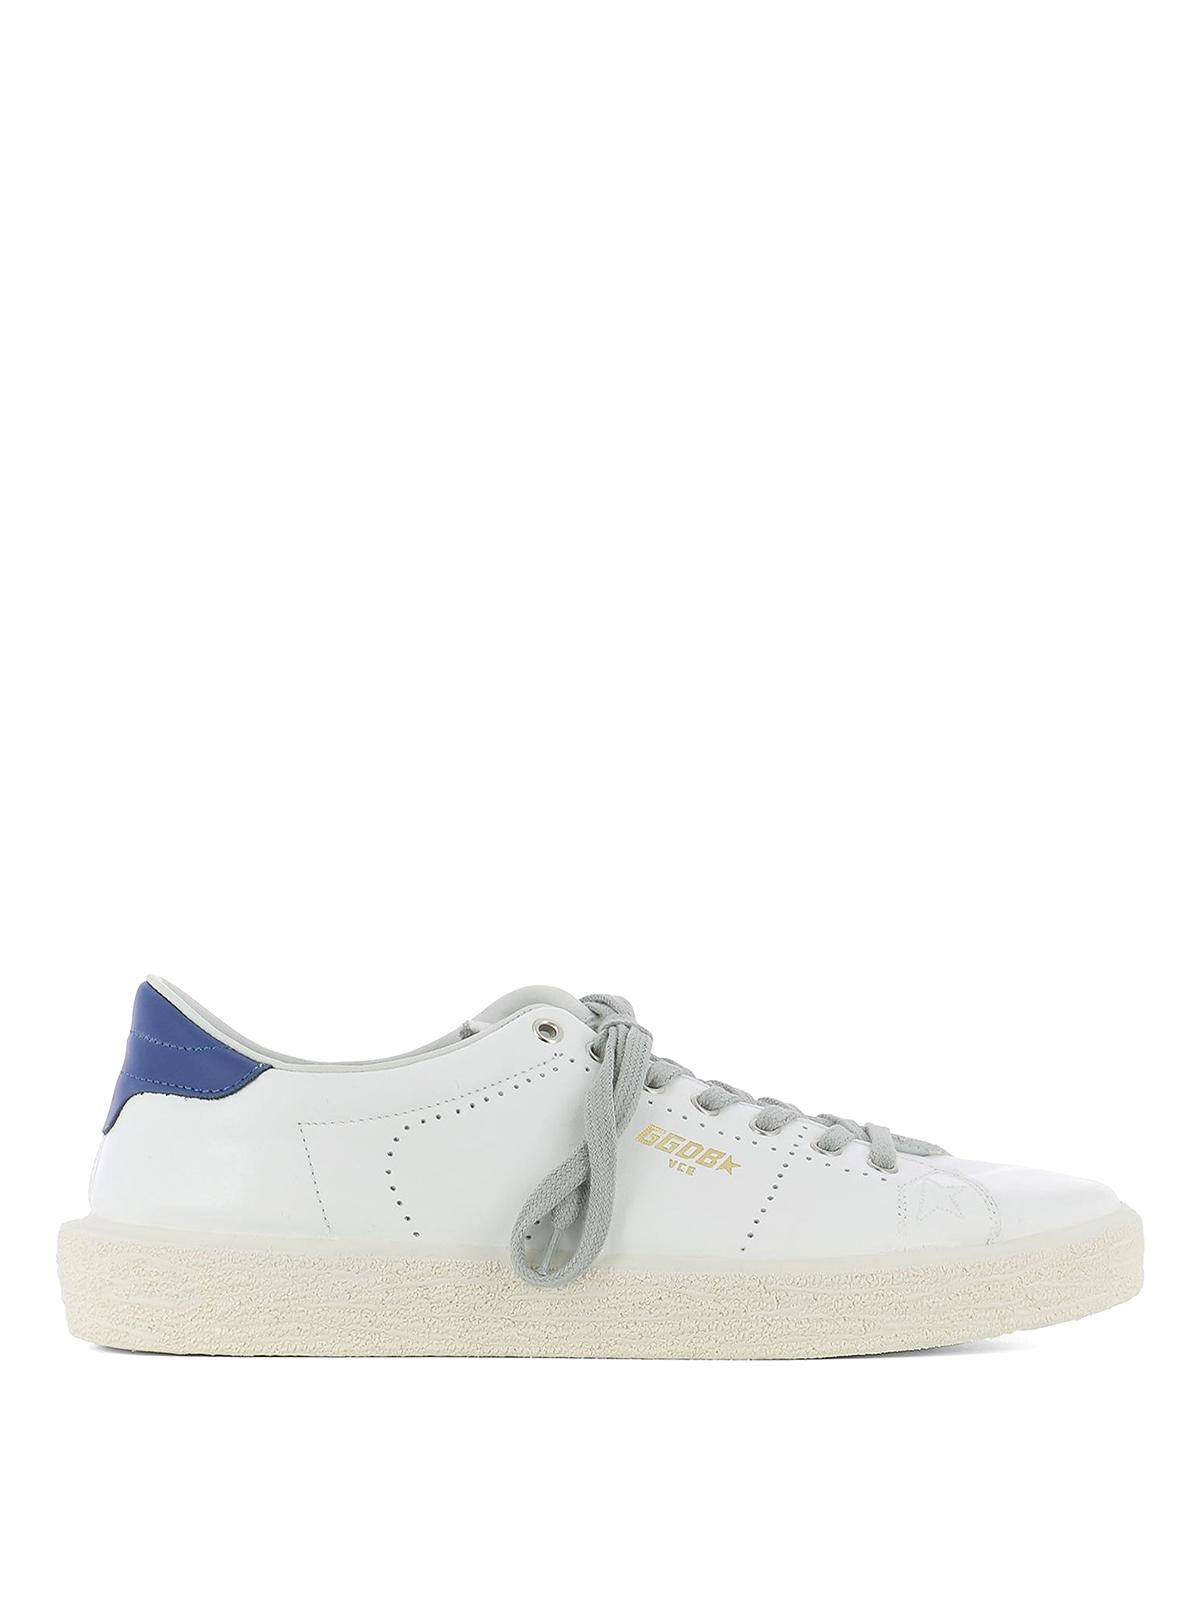 a686cb4cbb125 walnut golden goose ball star sneakers size 43 gold golden goose 2.12  sneakers for women